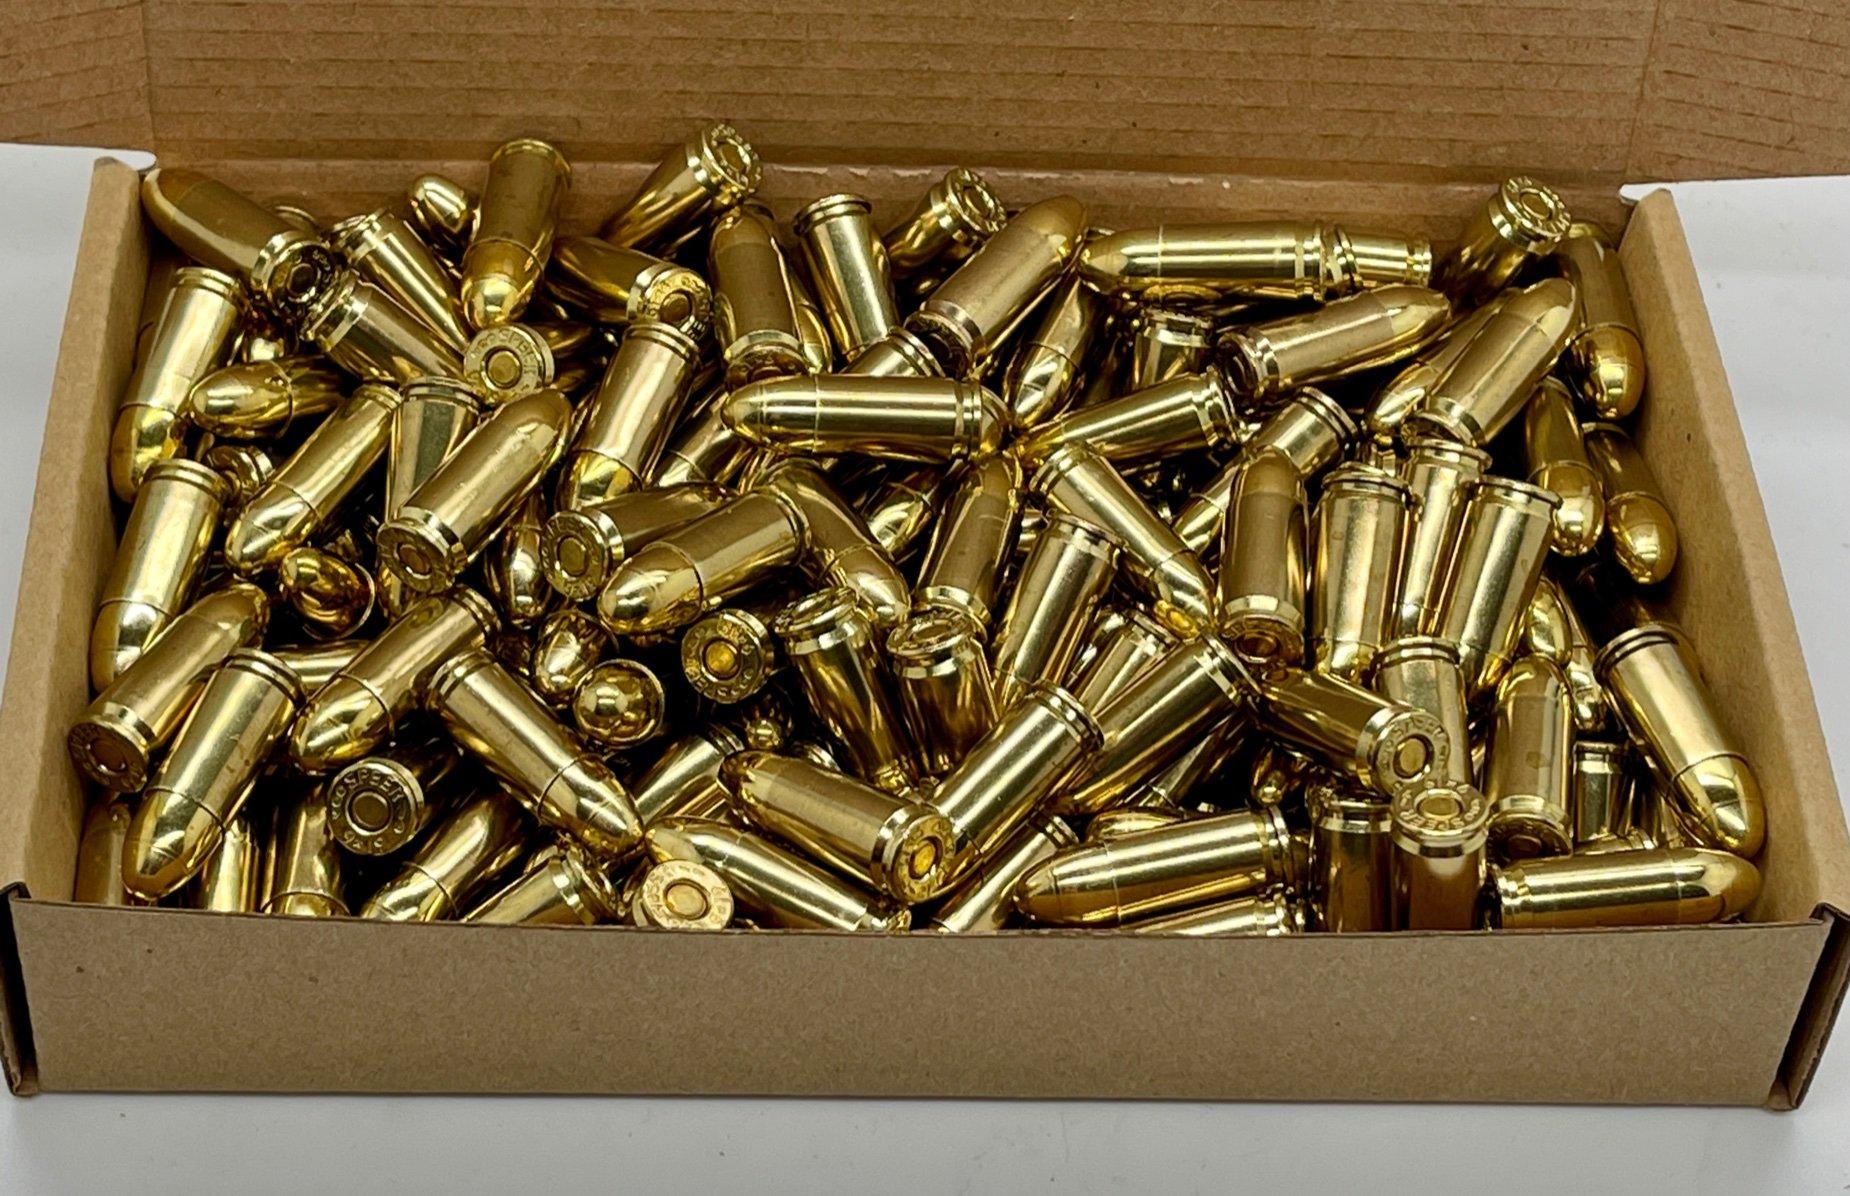 ZMA Ammo Premium 9x19mm 200 stk. 124gr. FMJ